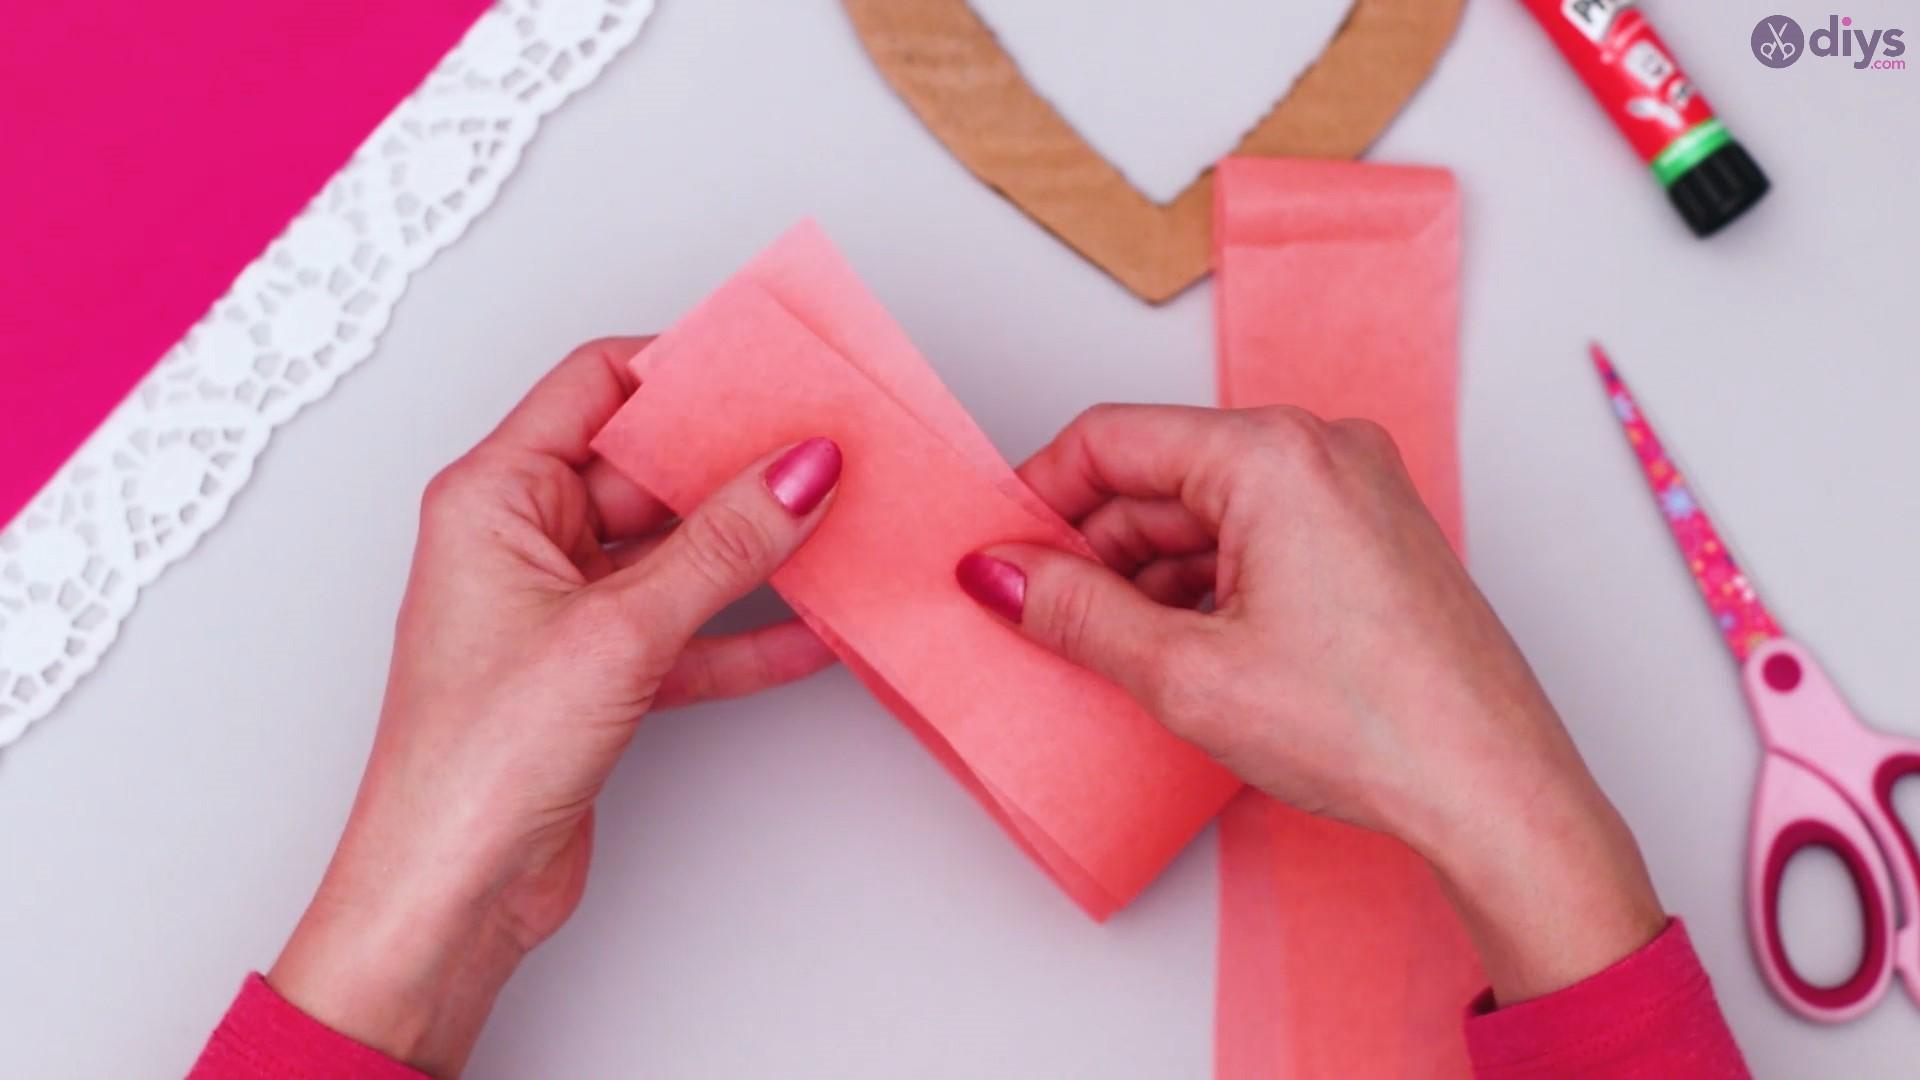 Diy tissue paper puffy heart step 1 (7)